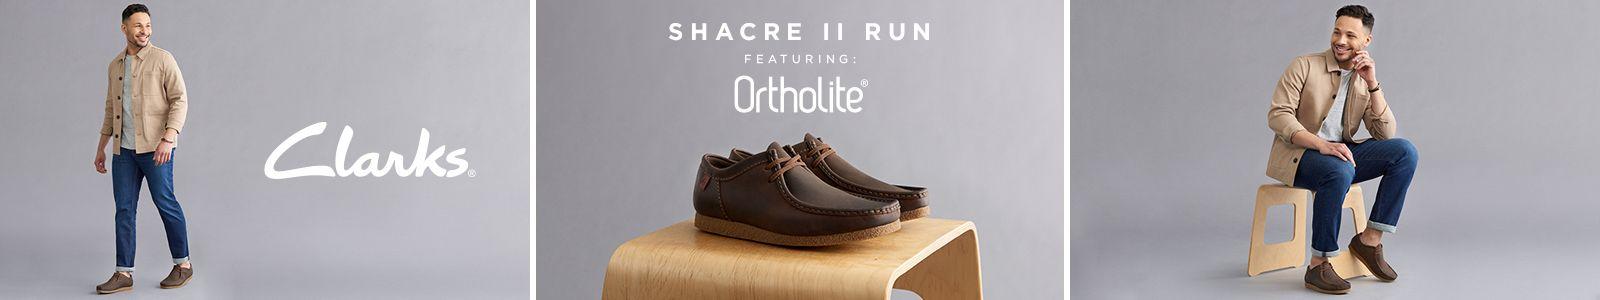 Clarks, Shacre II Run, Featuring: Ortholite